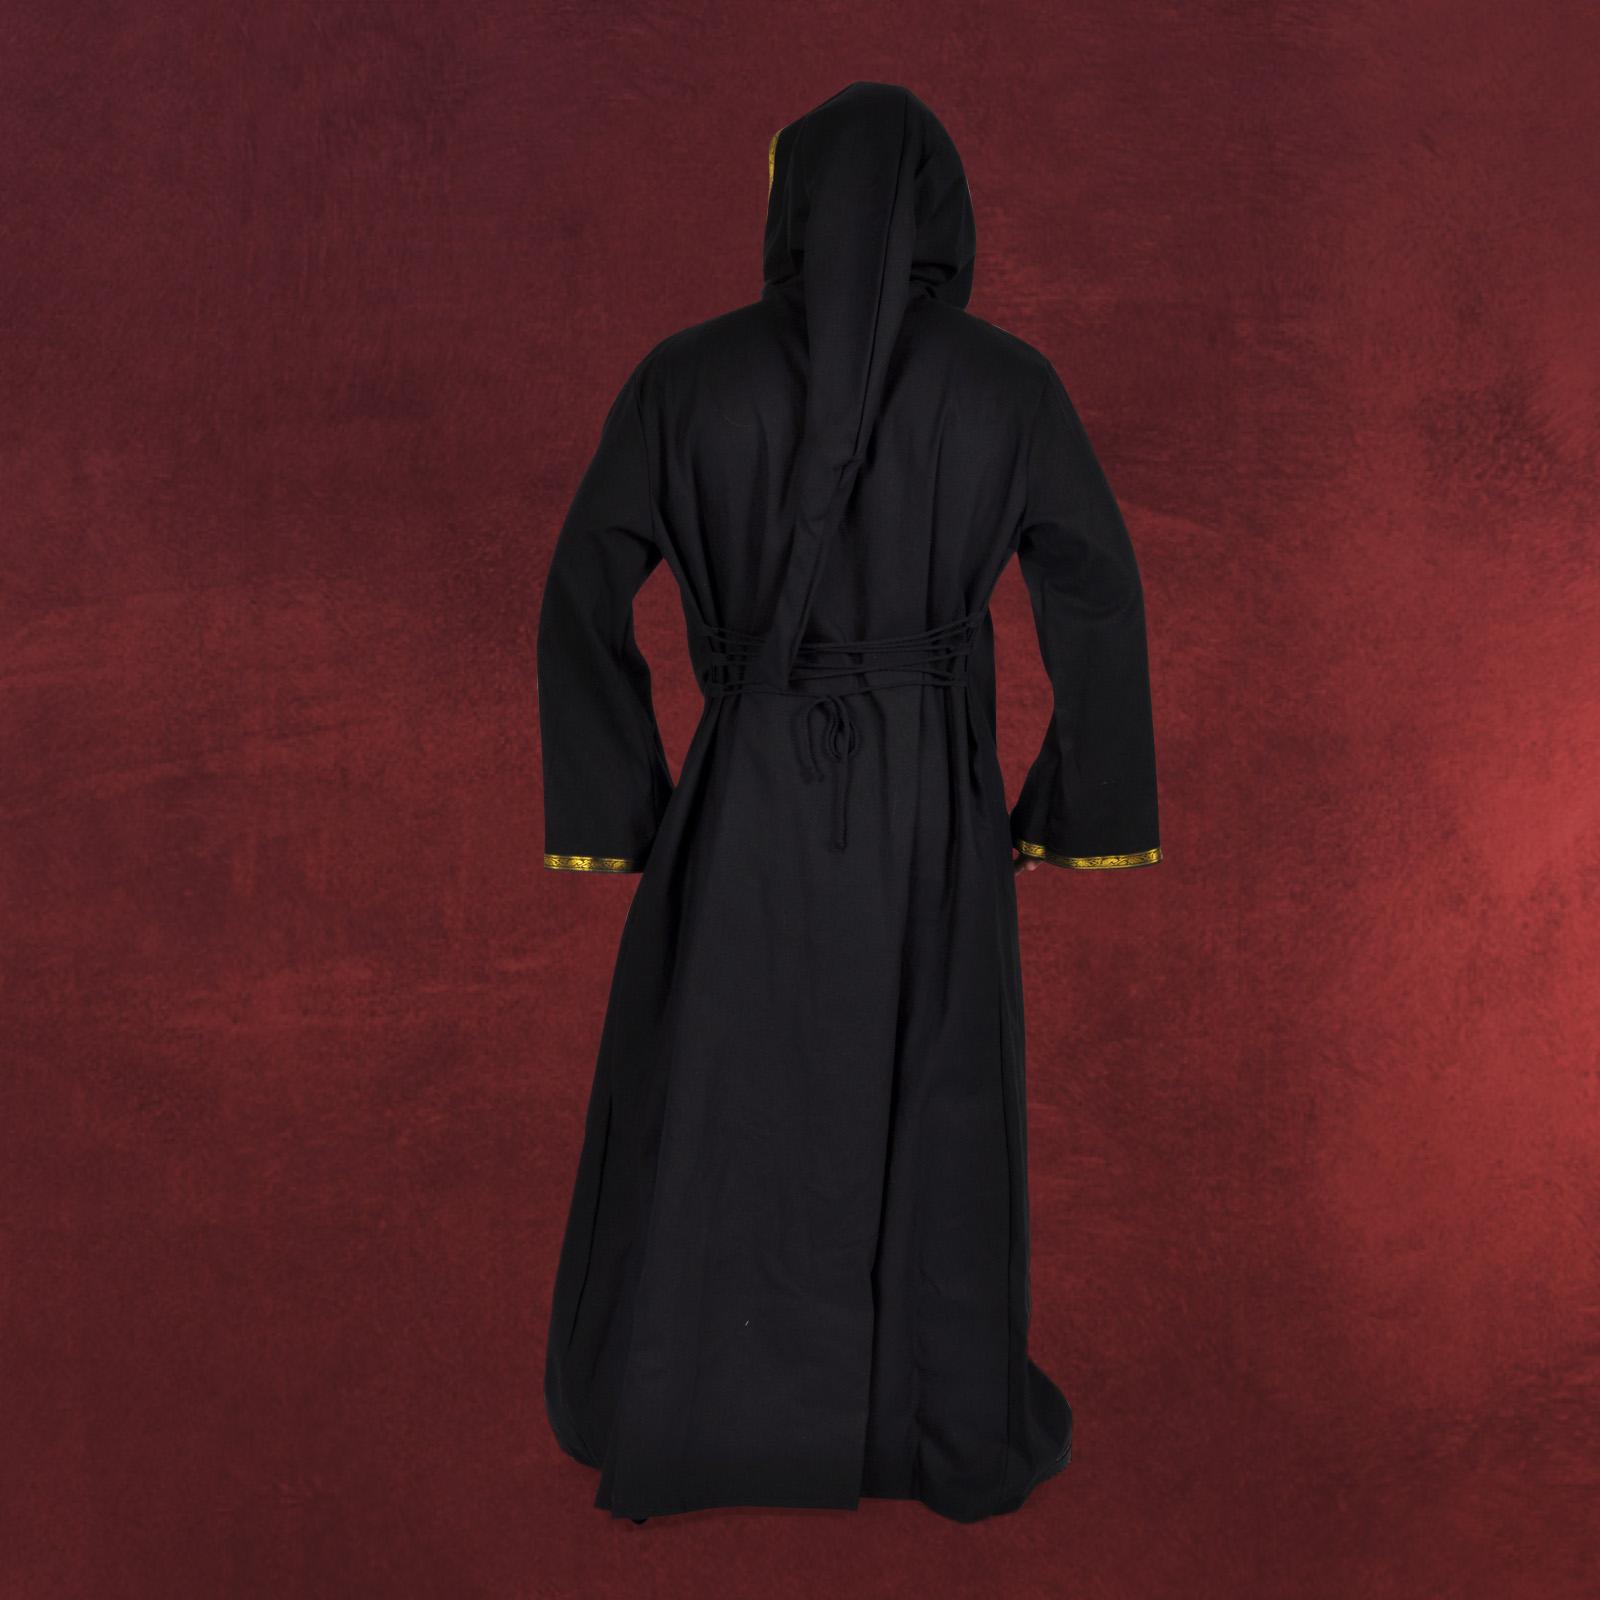 schwarzer mantel herren herren kost m schwarzer mantel. Black Bedroom Furniture Sets. Home Design Ideas